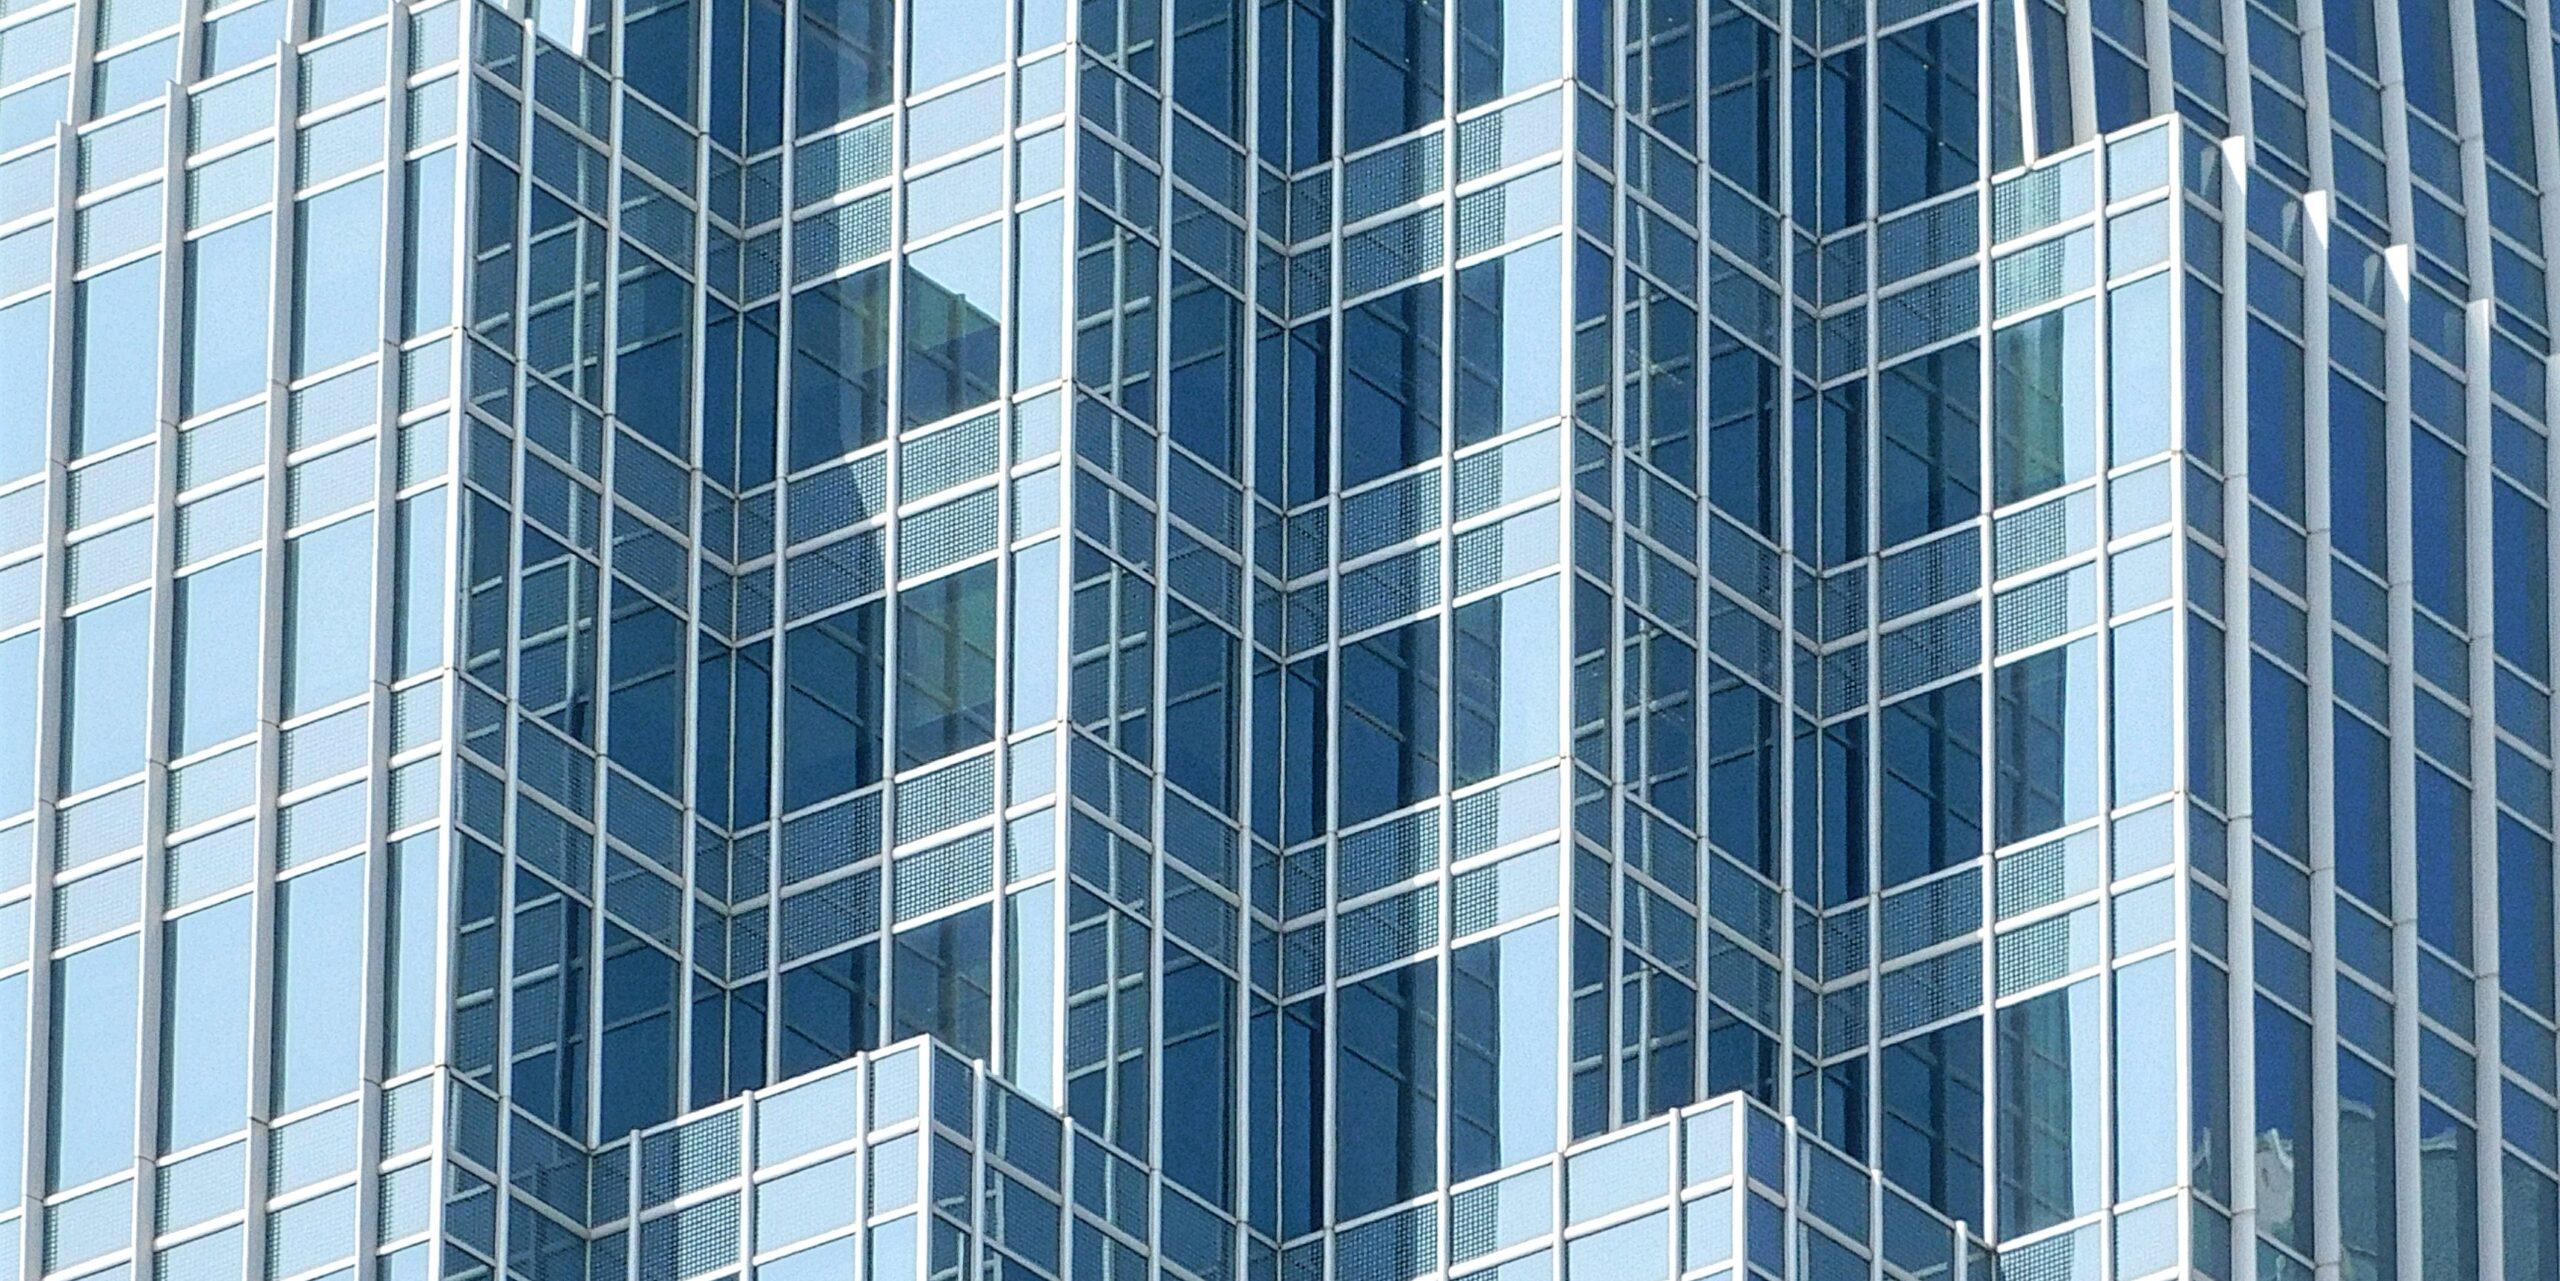 pexels-john-lee-6100567 (2)